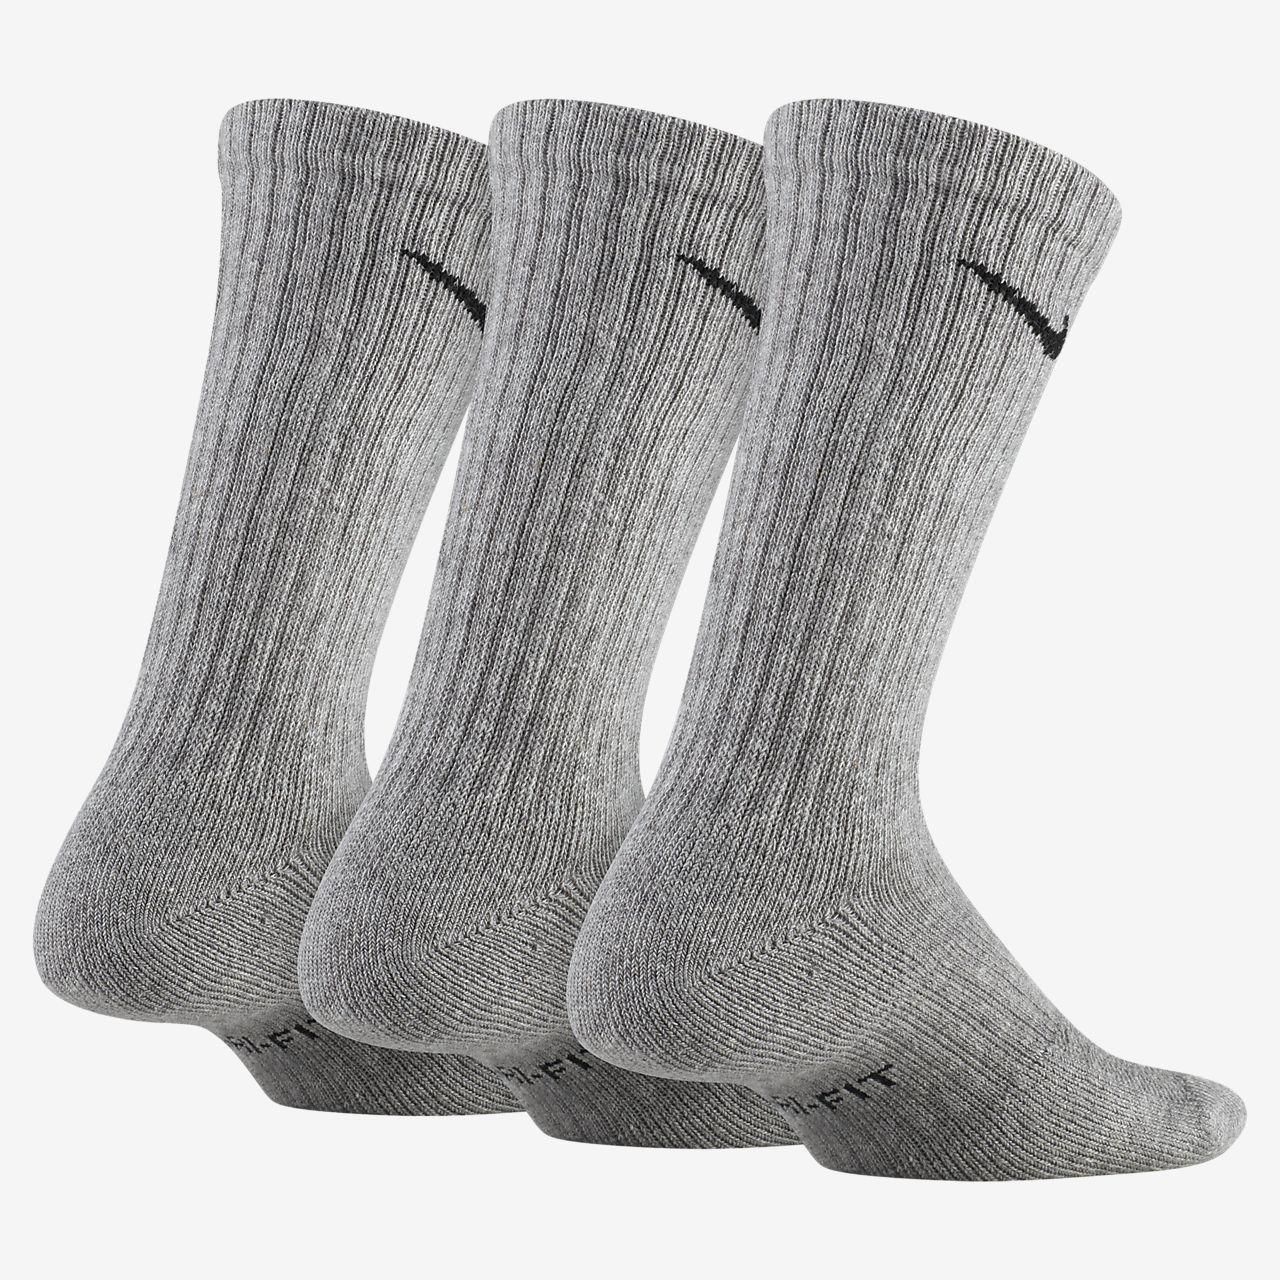 Nike Performance Cushioned Crew Kids' Training Socks (3 Pair)